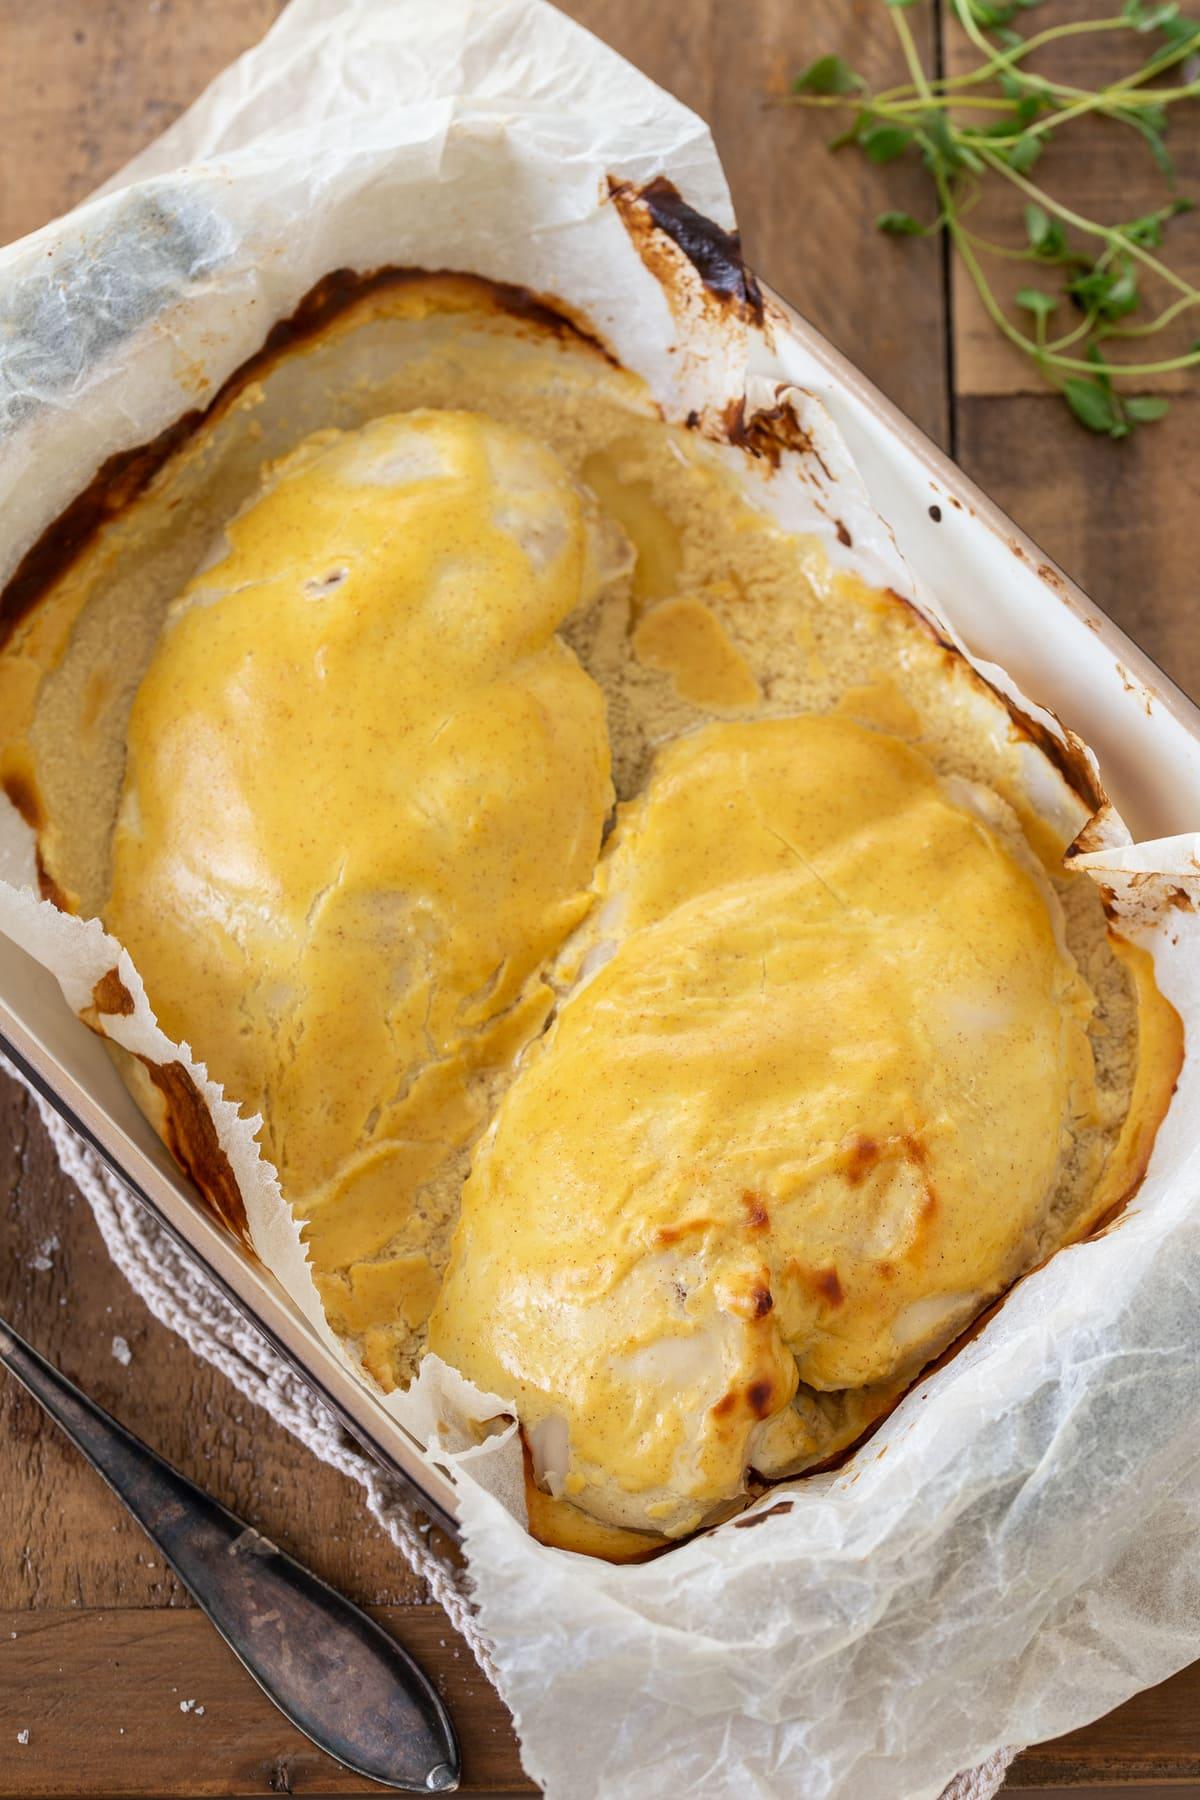 Baked mustard chicken in a casserole dish.